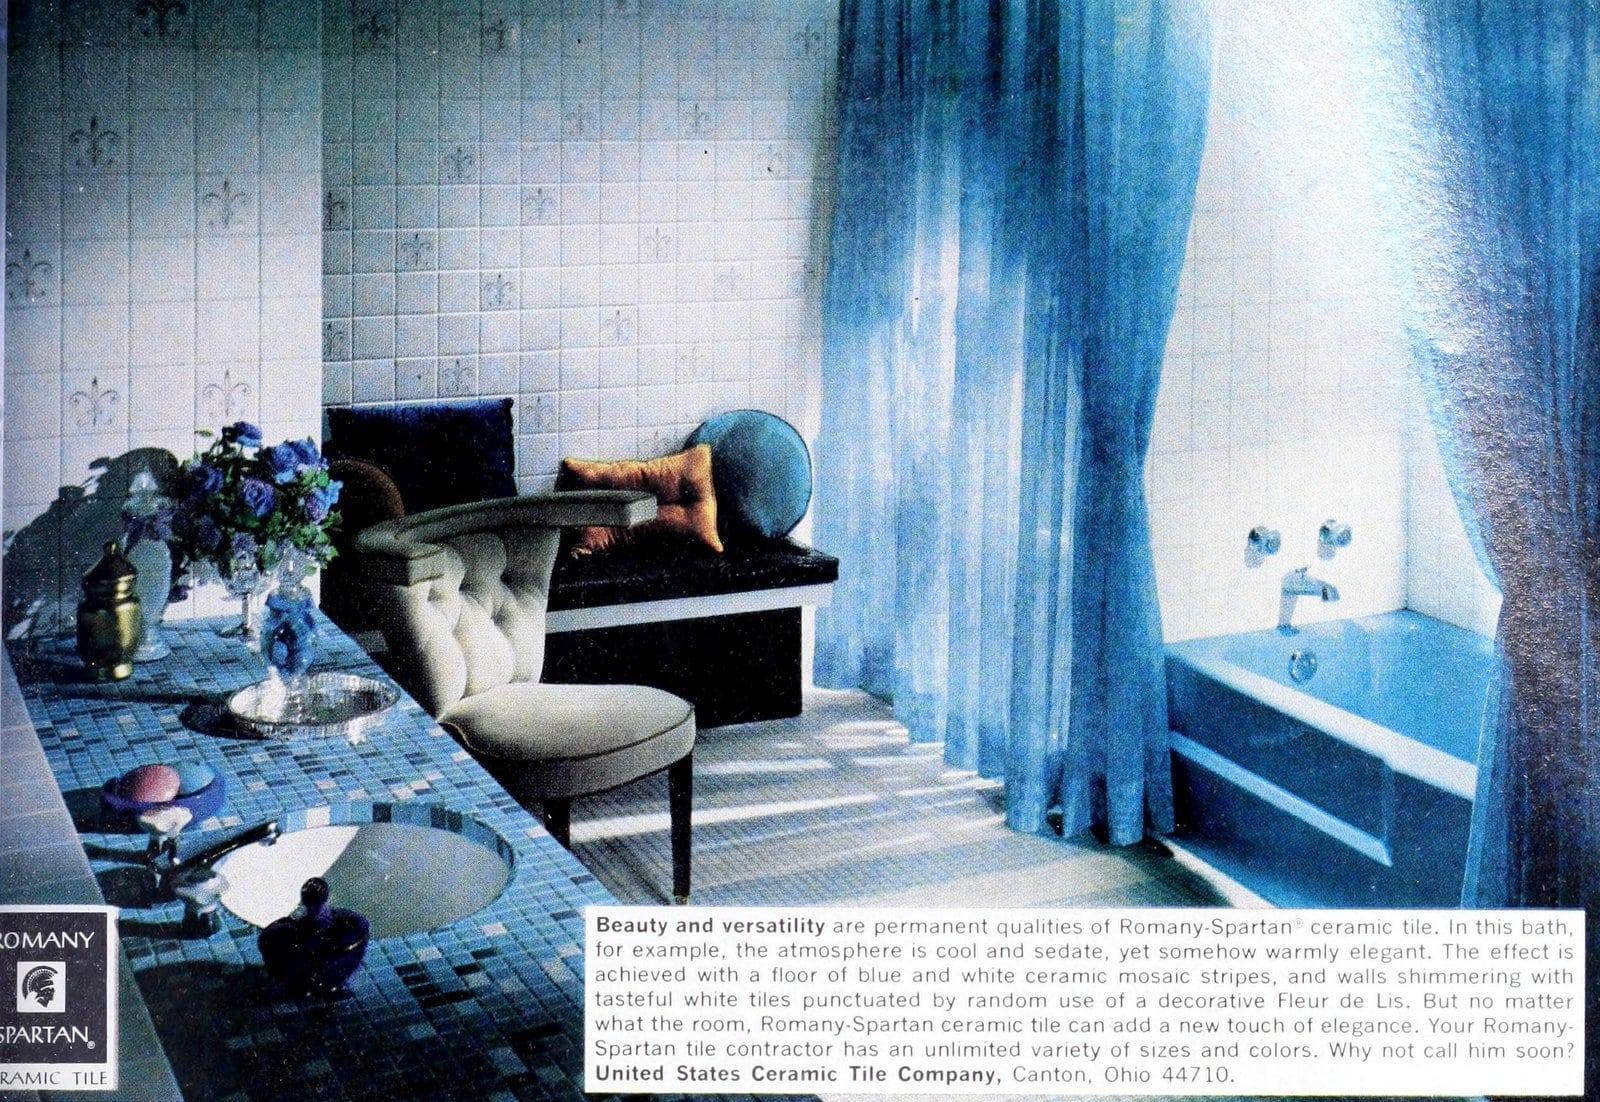 Retro blue and white ceramic mosaic stripes in bathroom